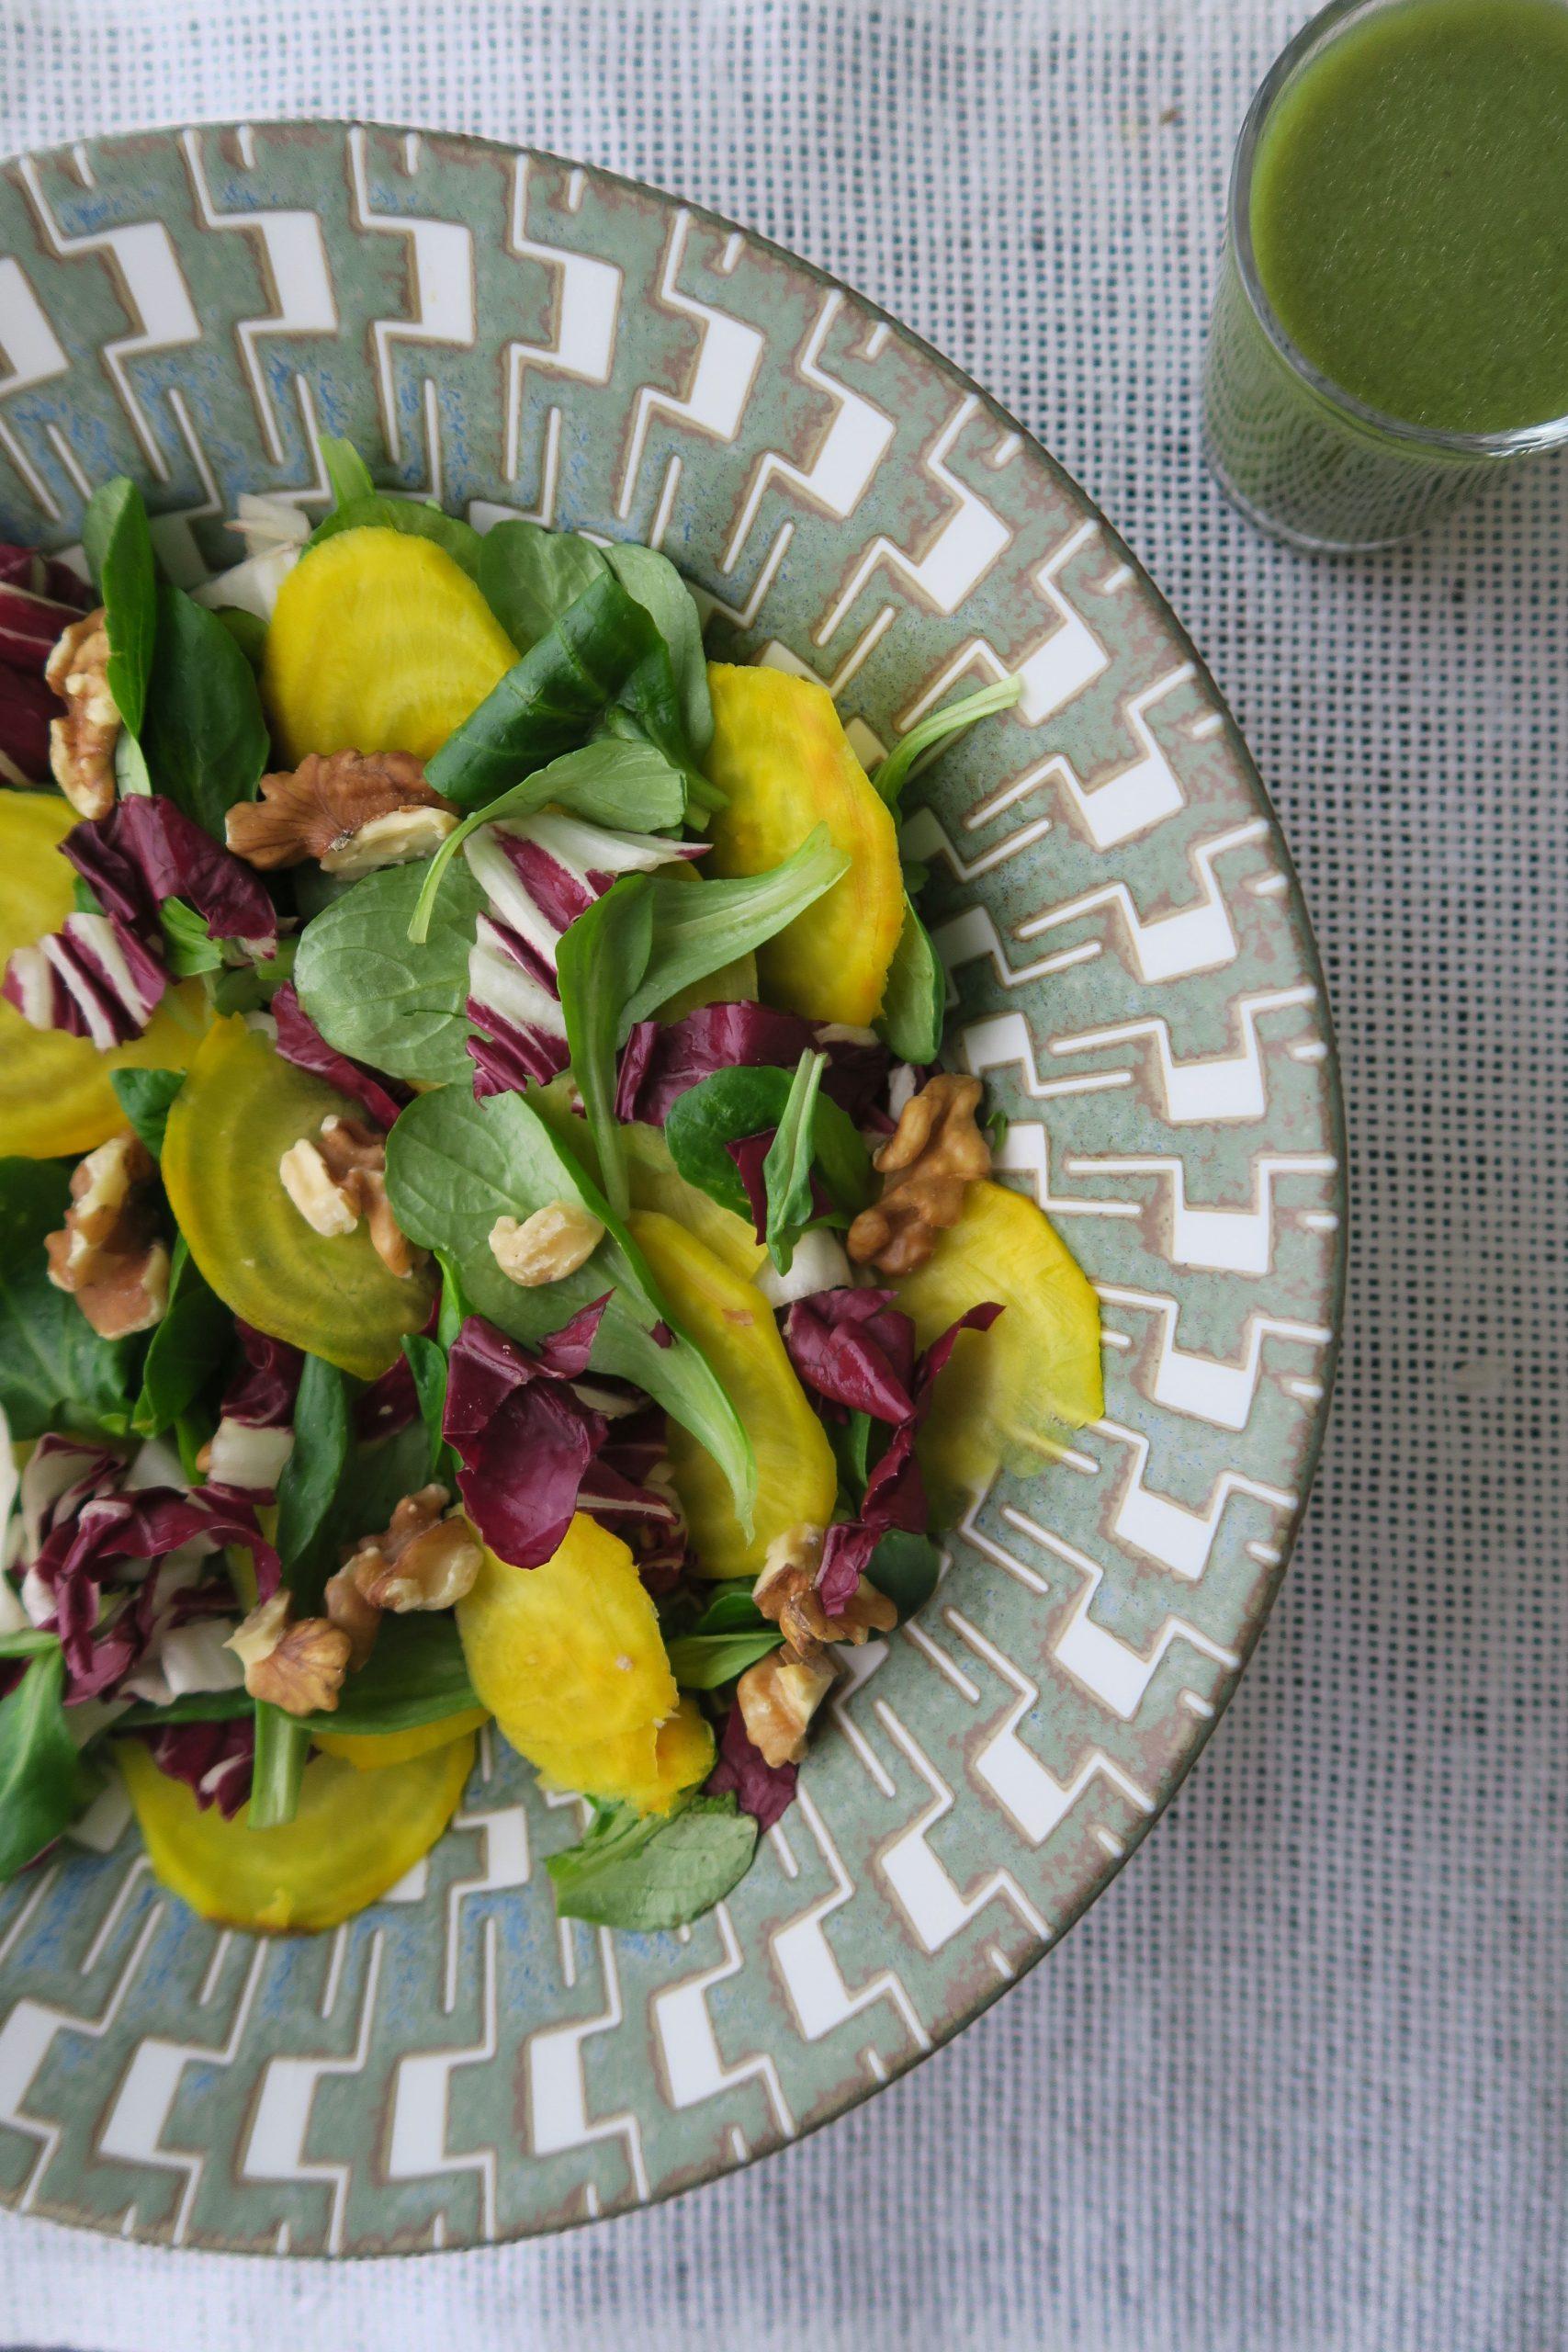 Blattsalate Gelbe Bete Nüsse